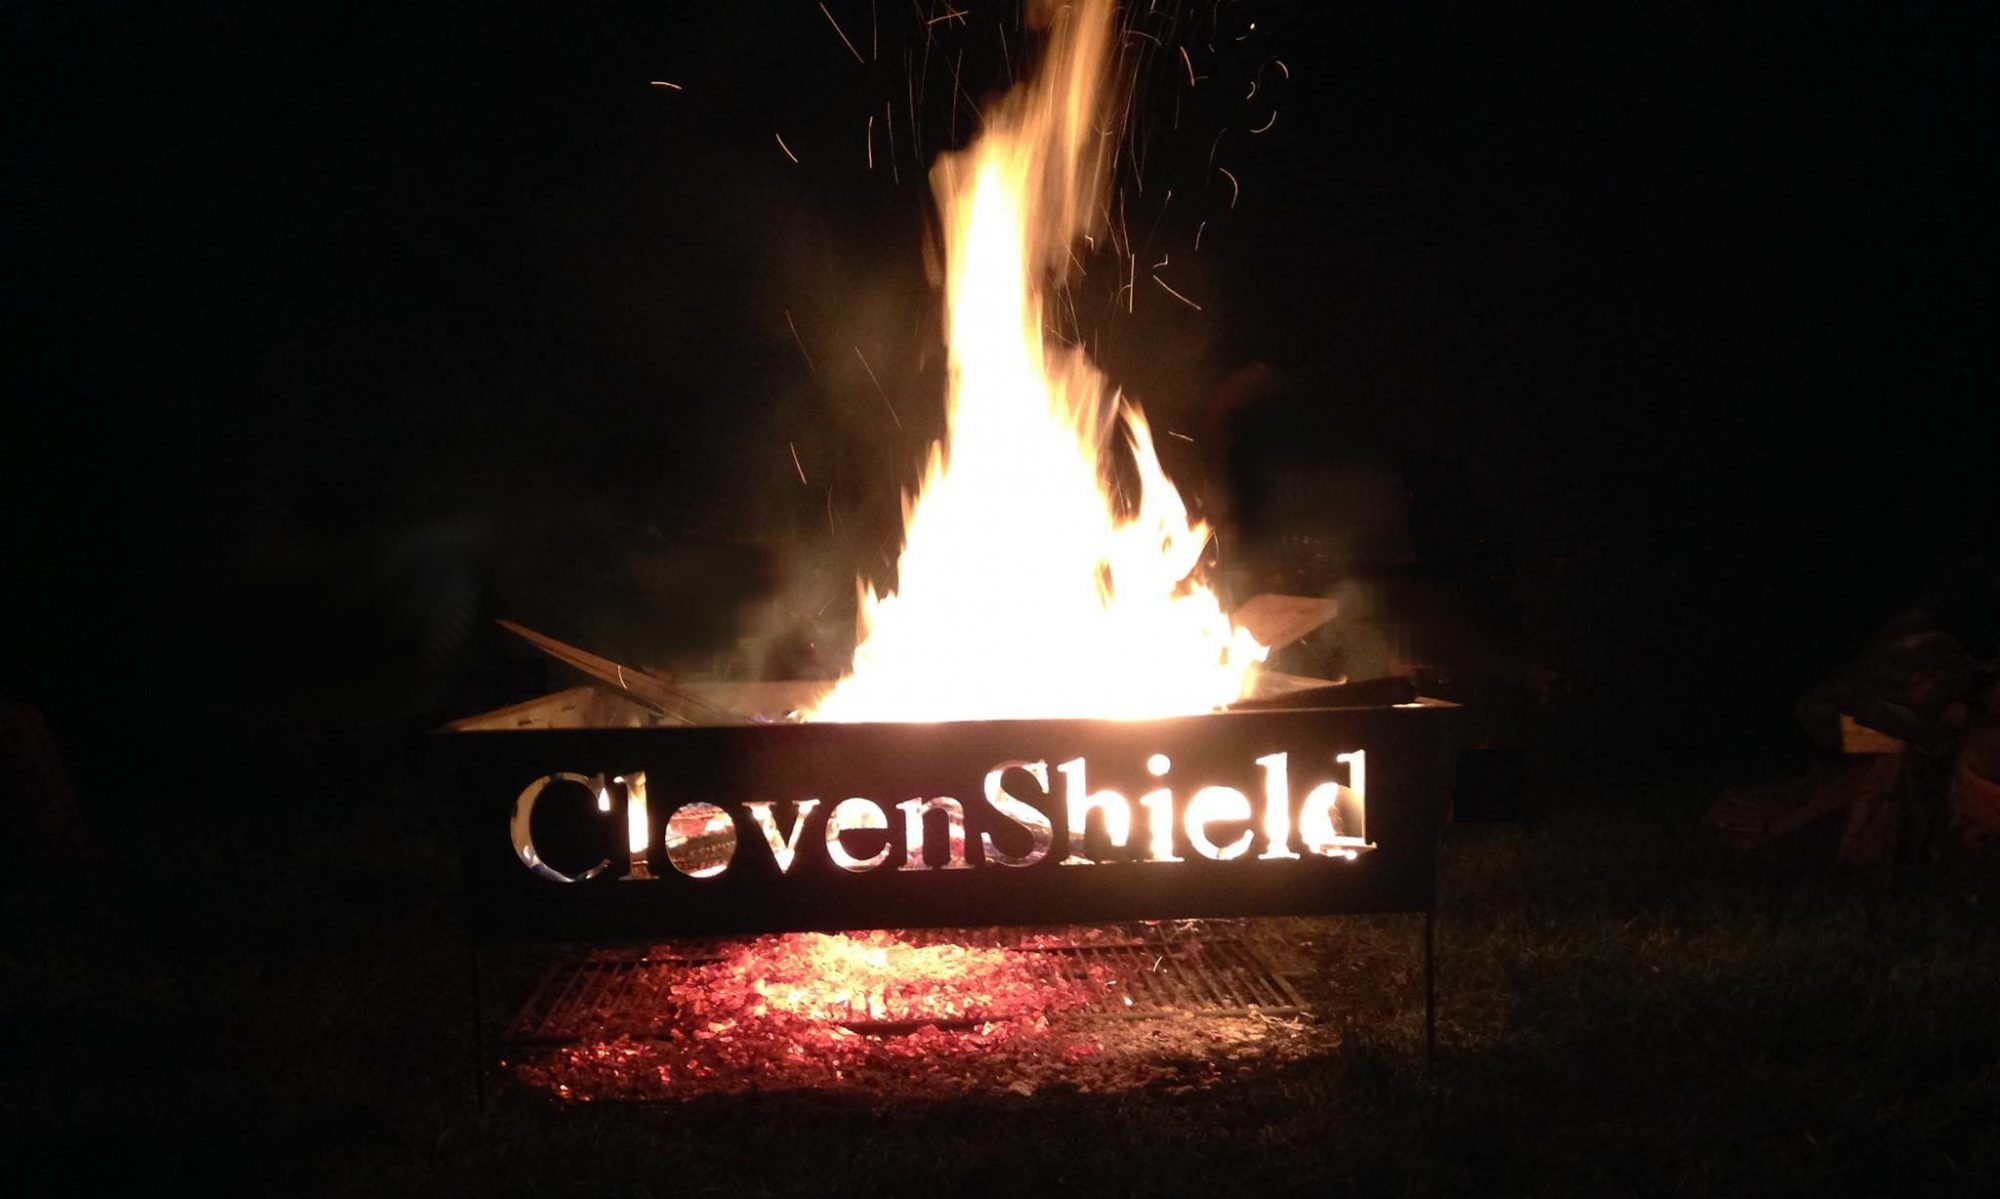 House Clovenshield